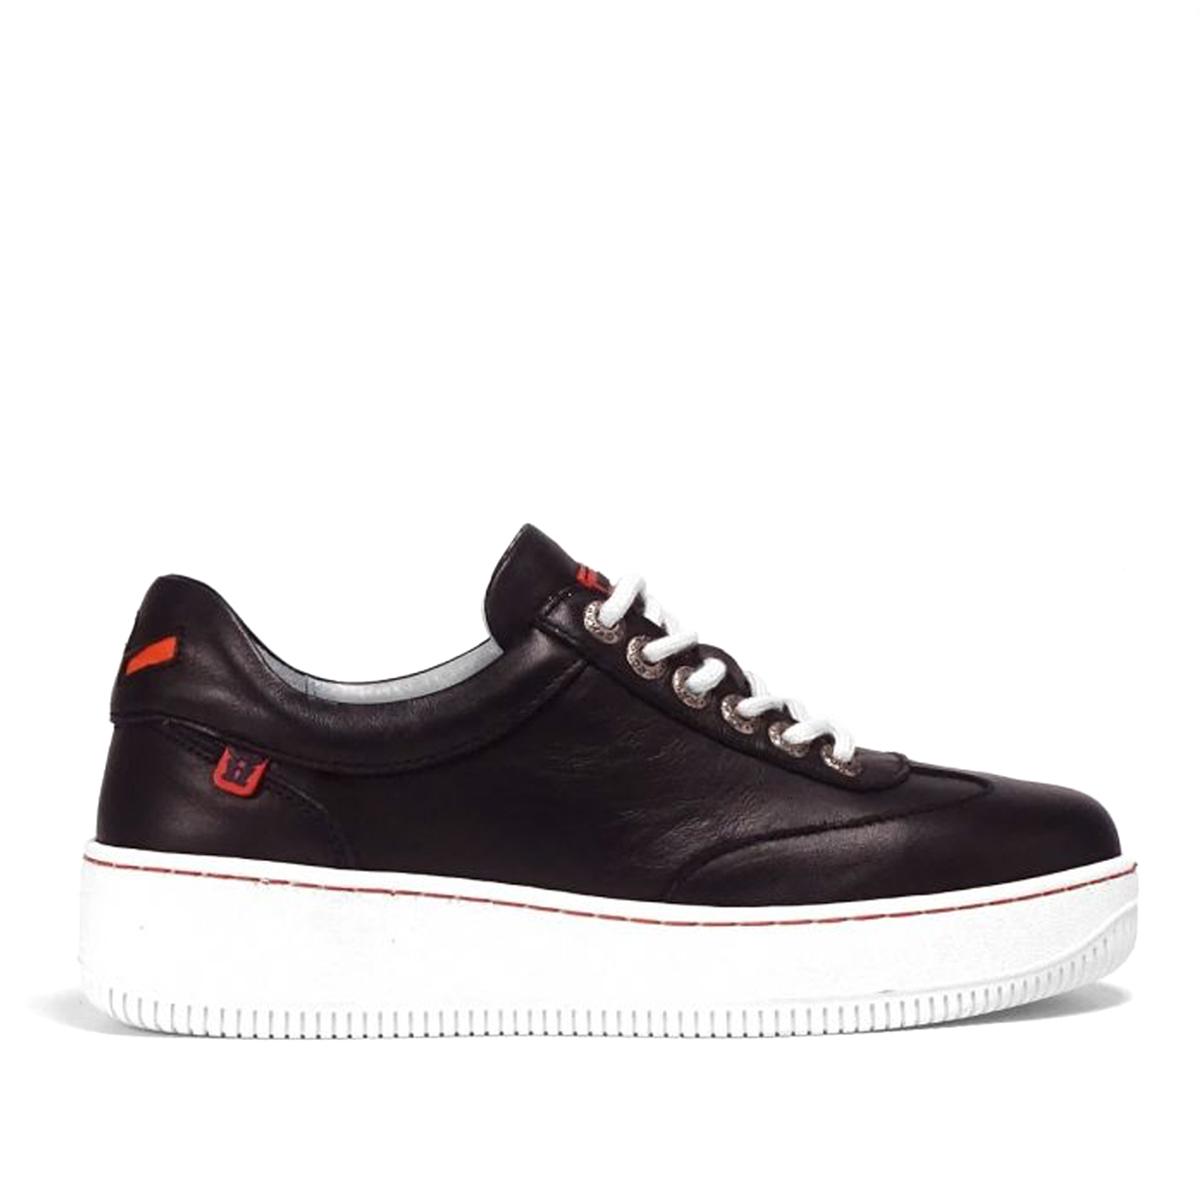 Sympasneaker 4216 Black